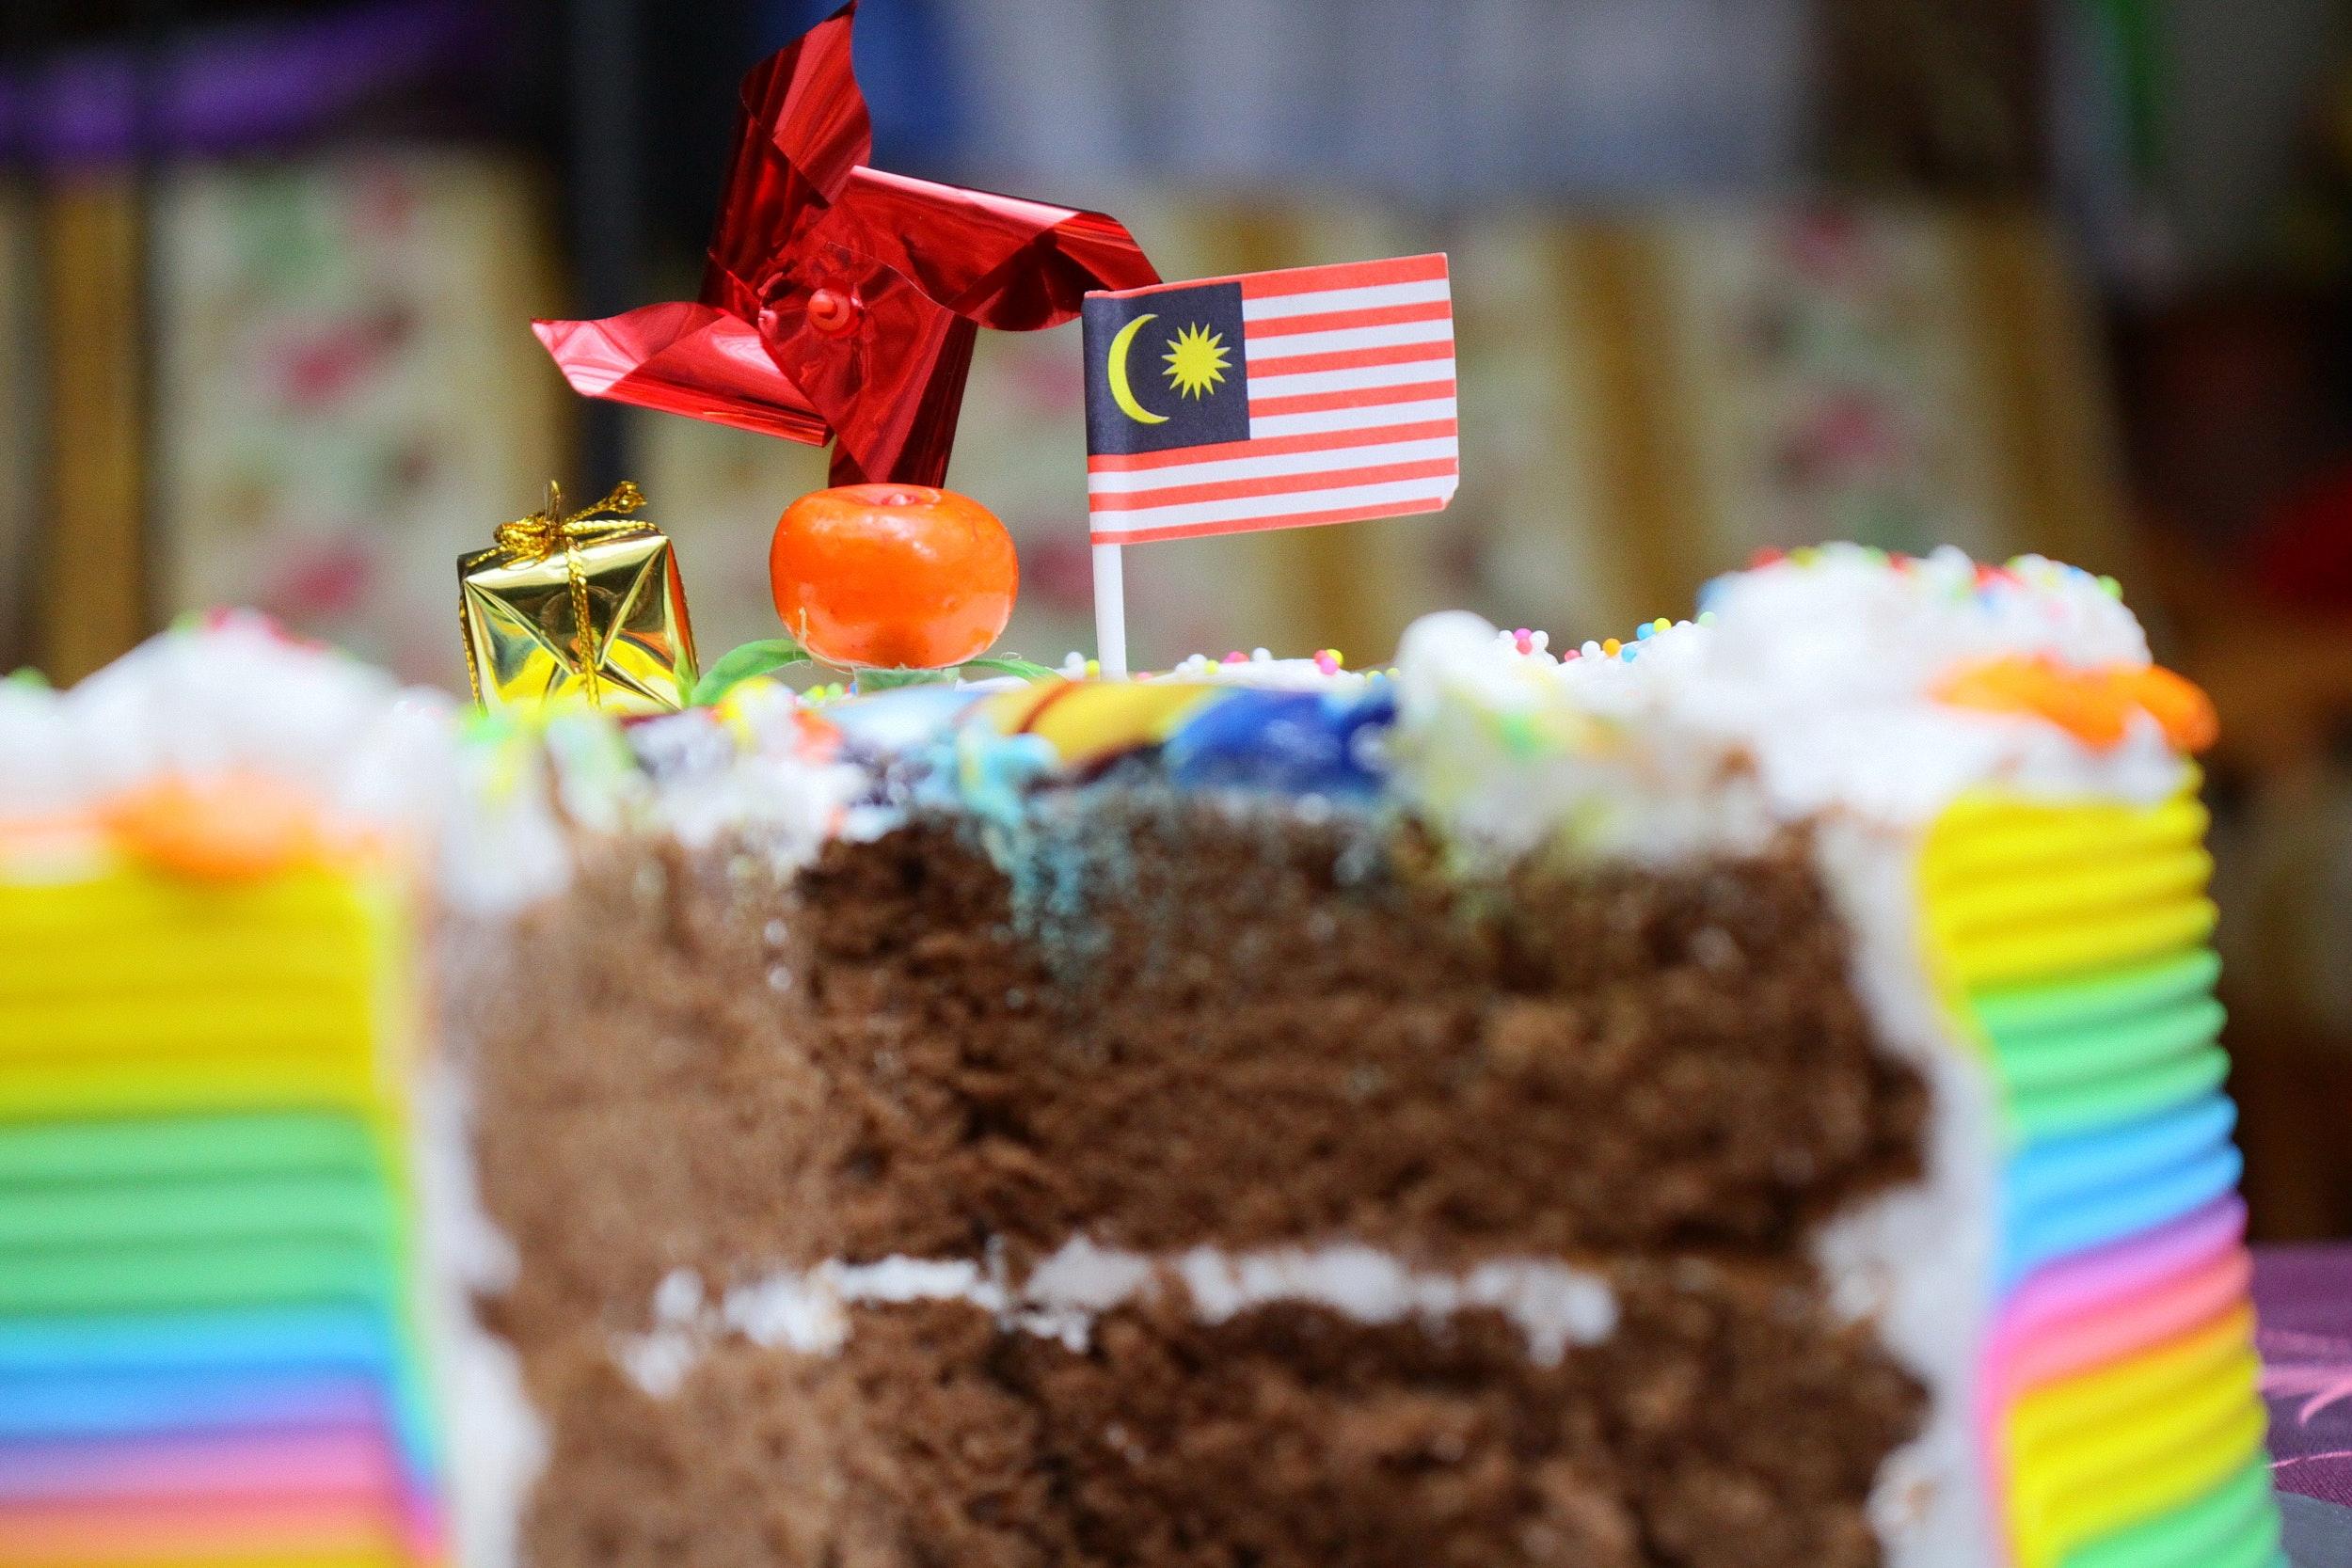 Close-up of Birthday Cake, Baked, Dessert, Sugar, Sprinkles, HQ Photo